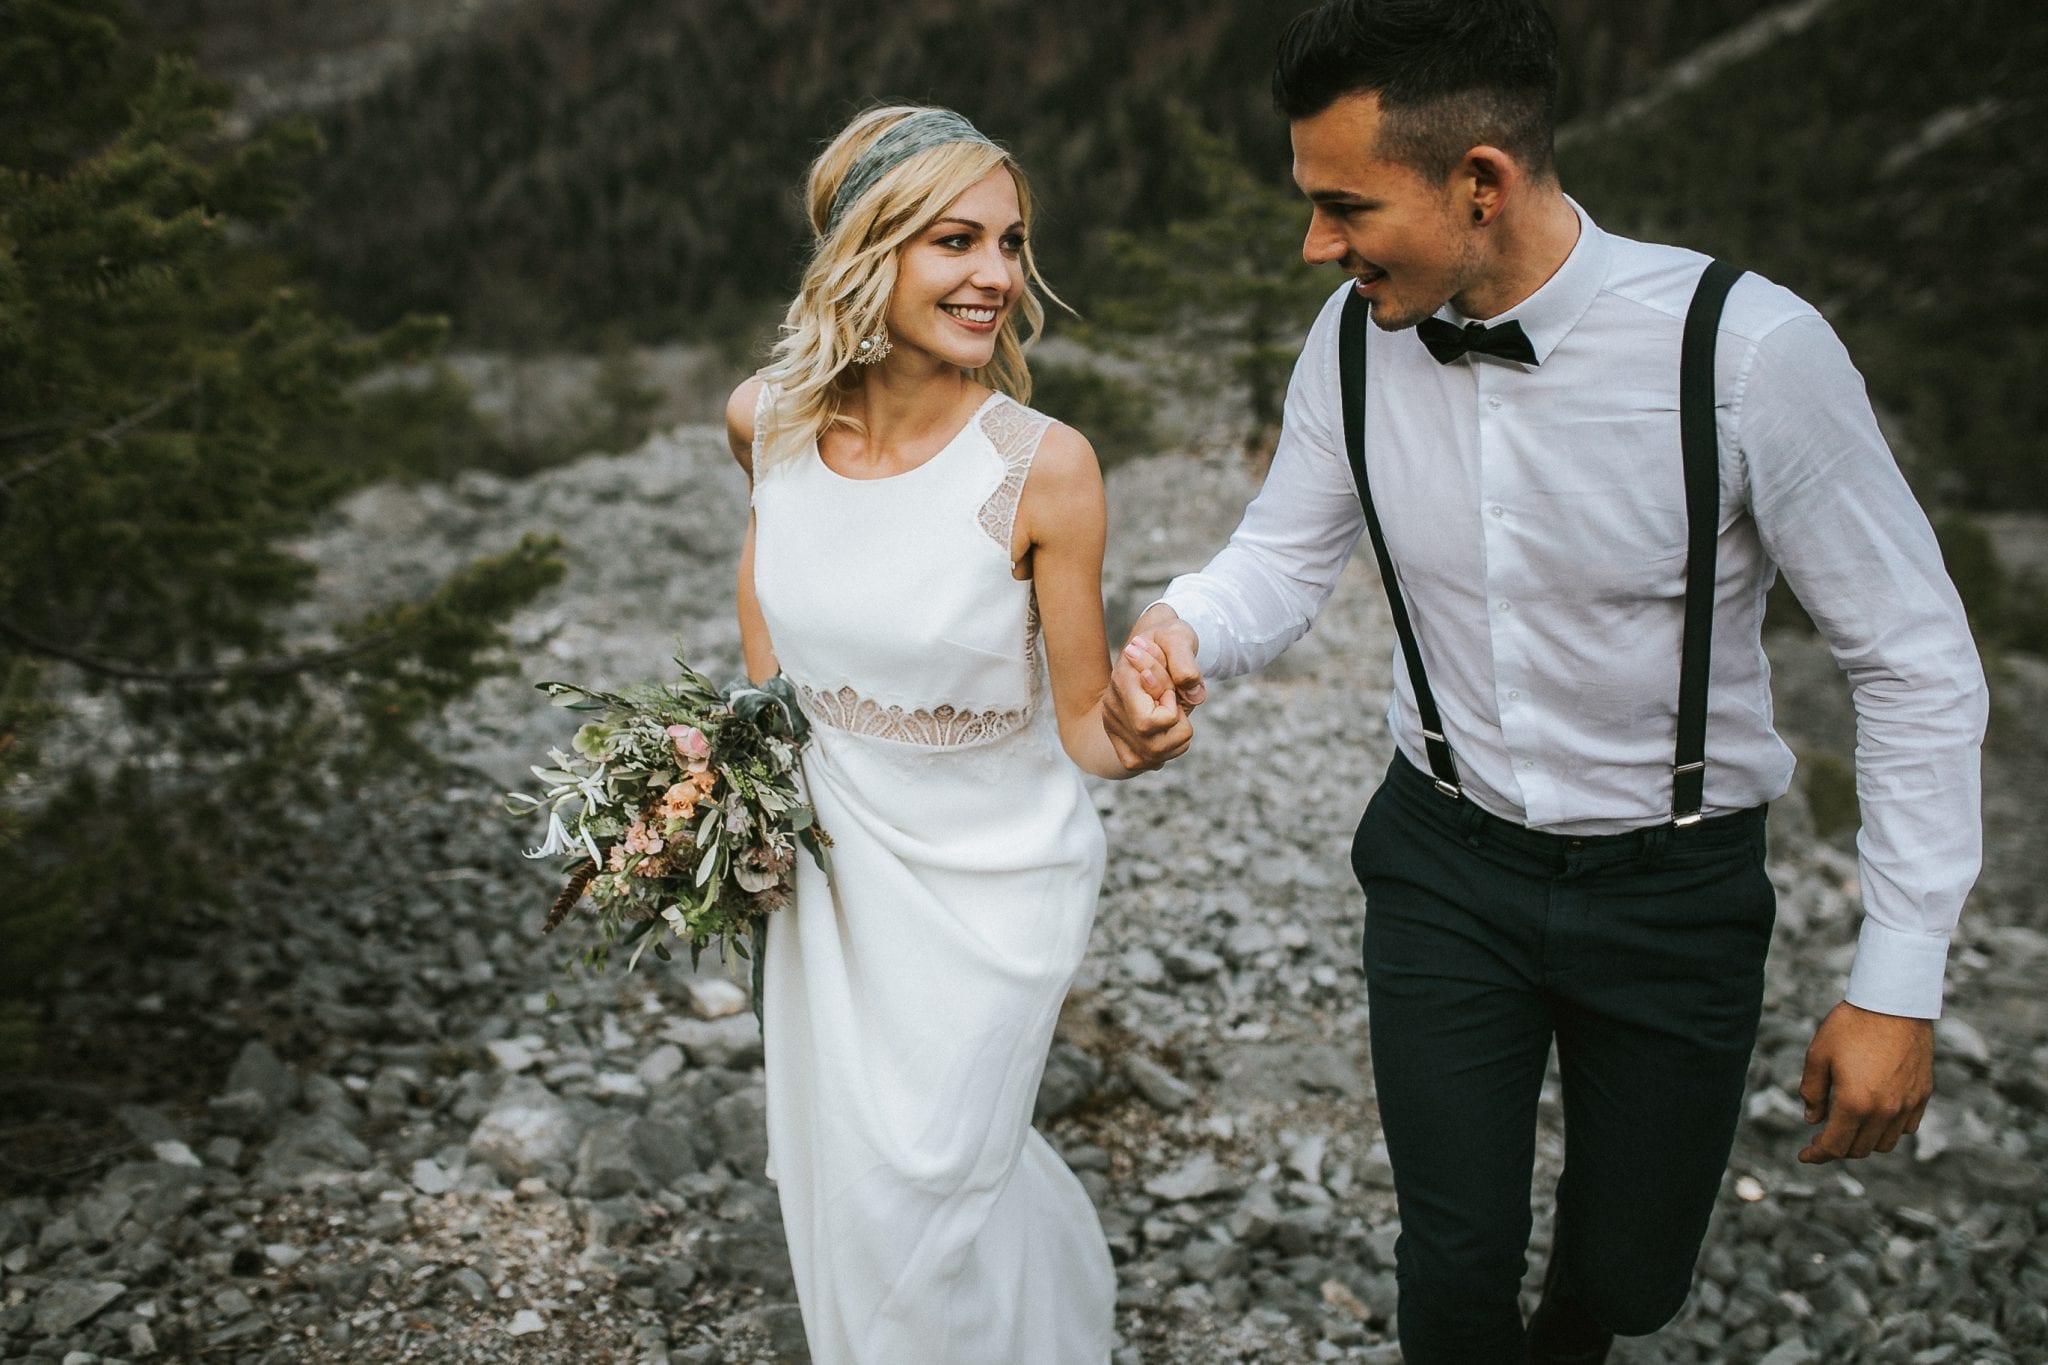 Elopement, Photo, Italy, Wedding, Boho, Style, Intimewedding, Blitzkneisser